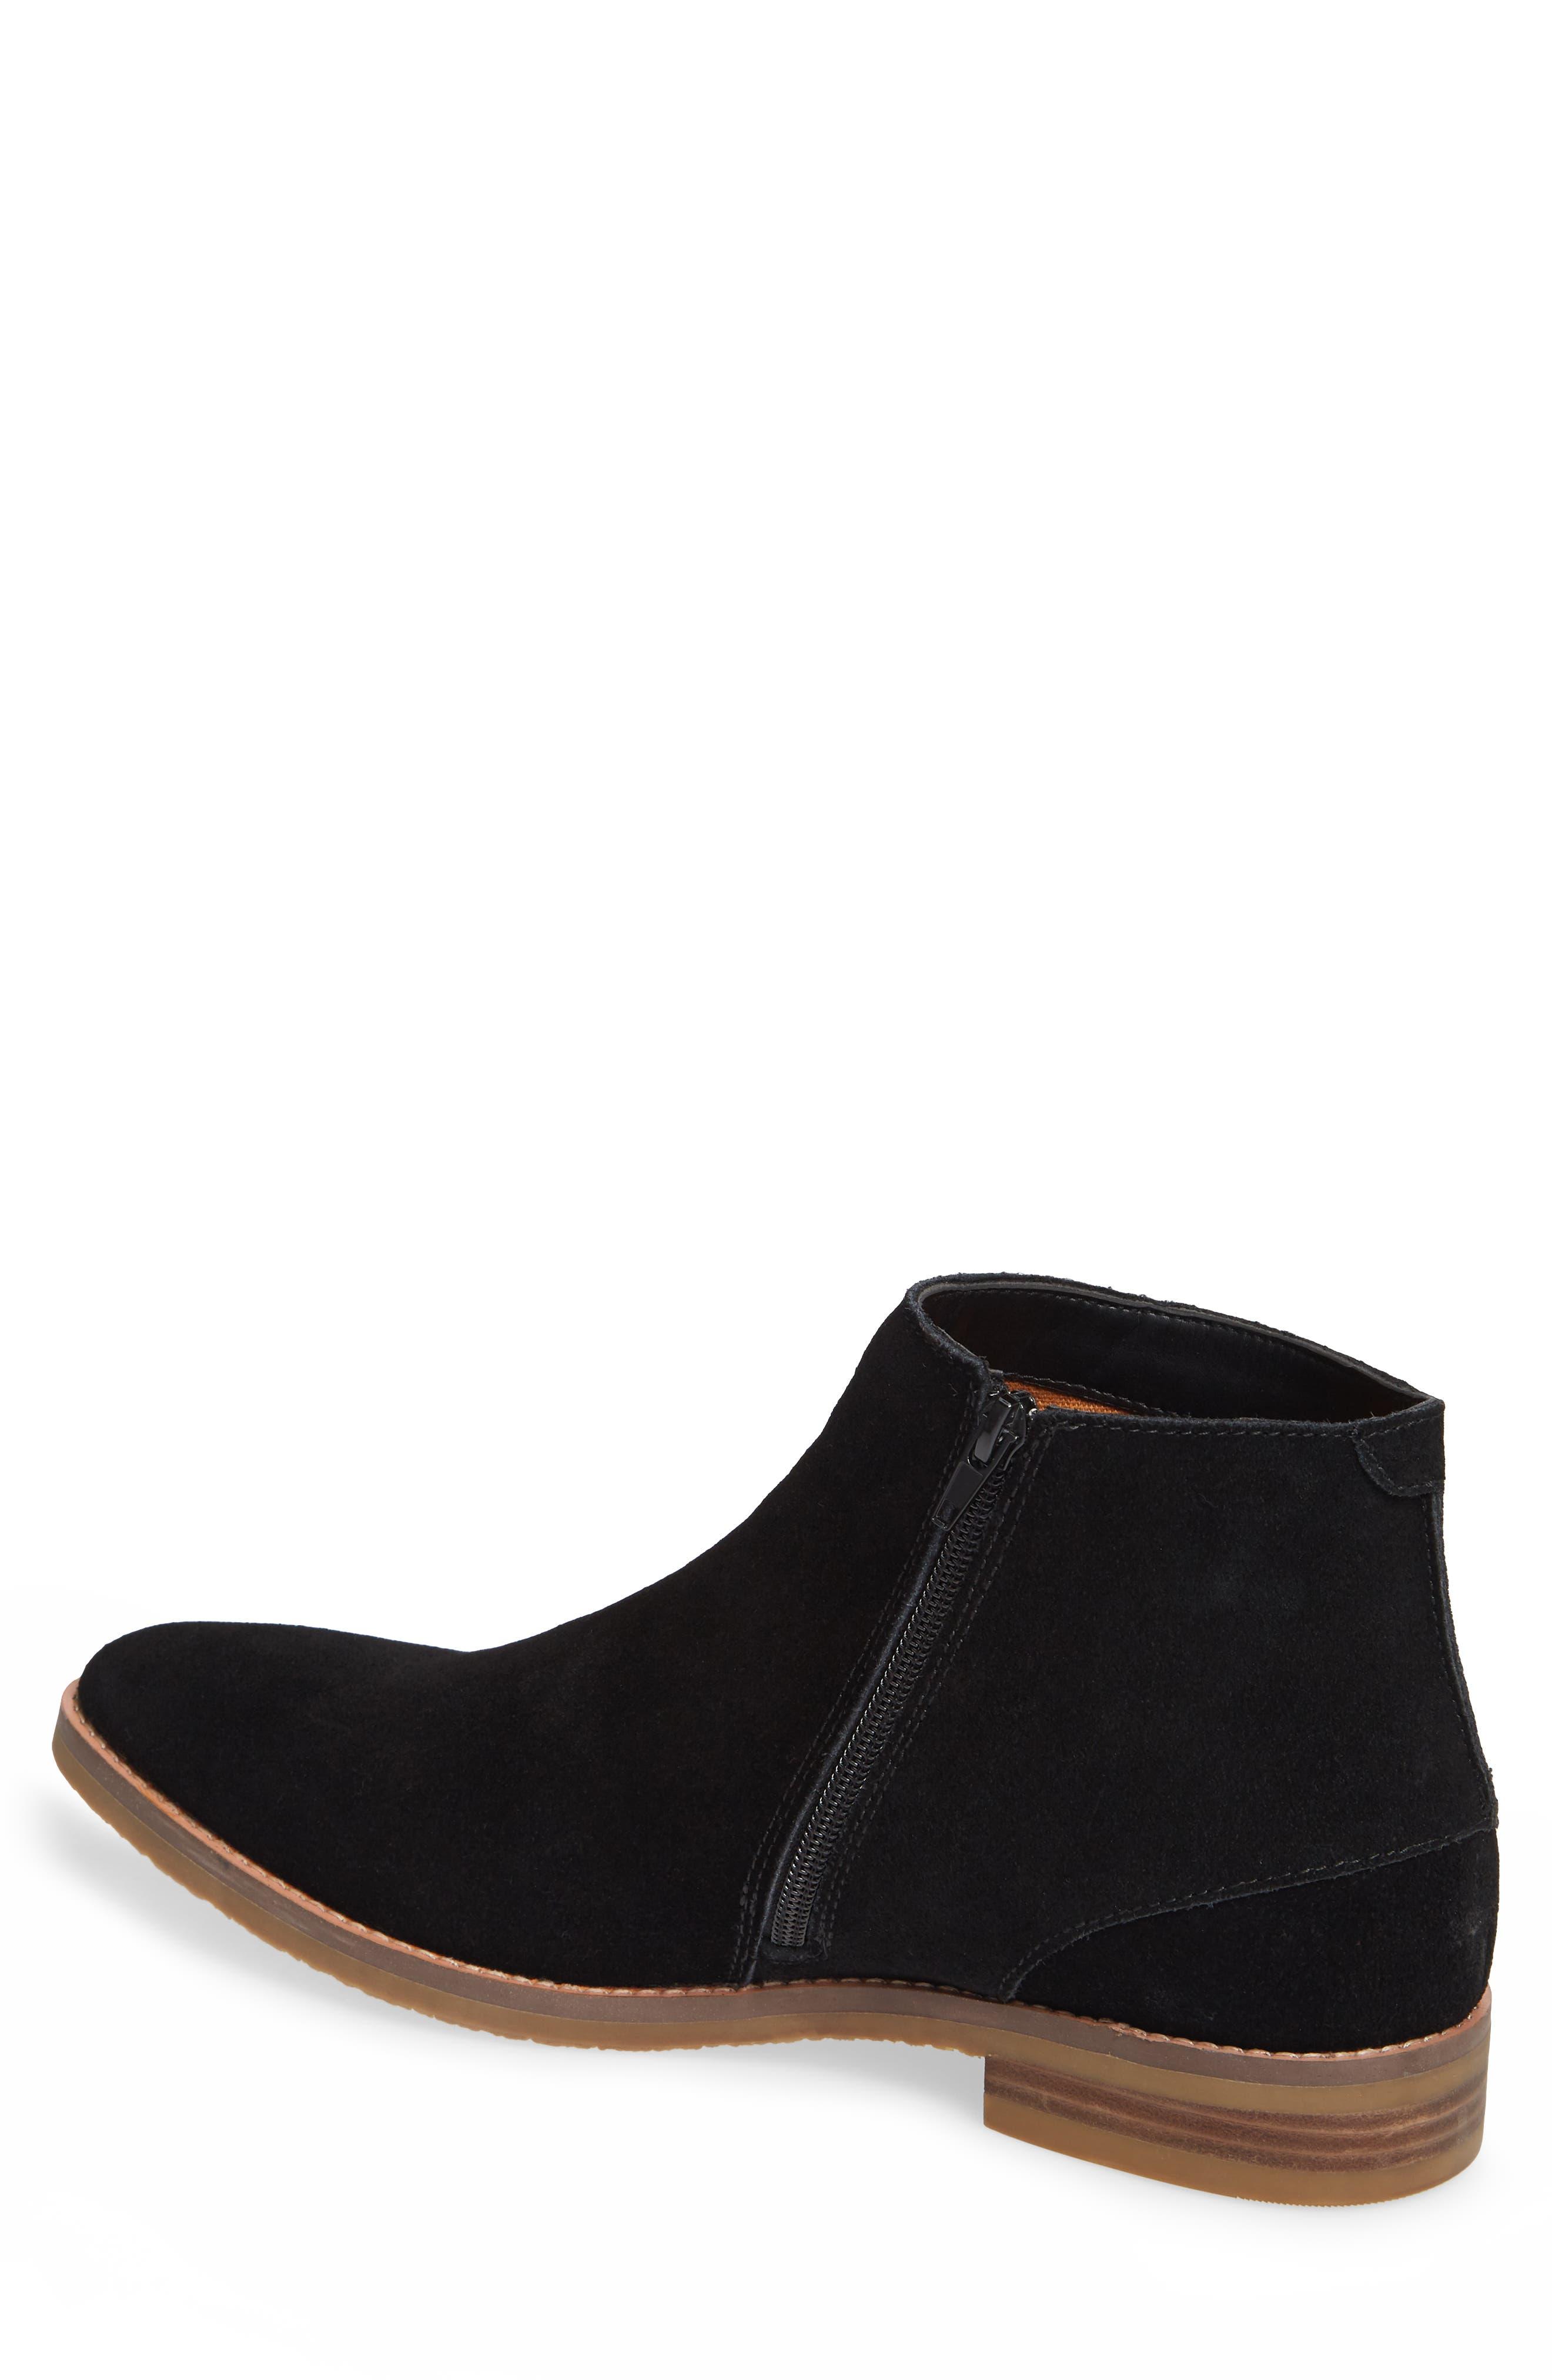 JUMP, Brighton Chelsea Zip Boot, Alternate thumbnail 2, color, BLACK